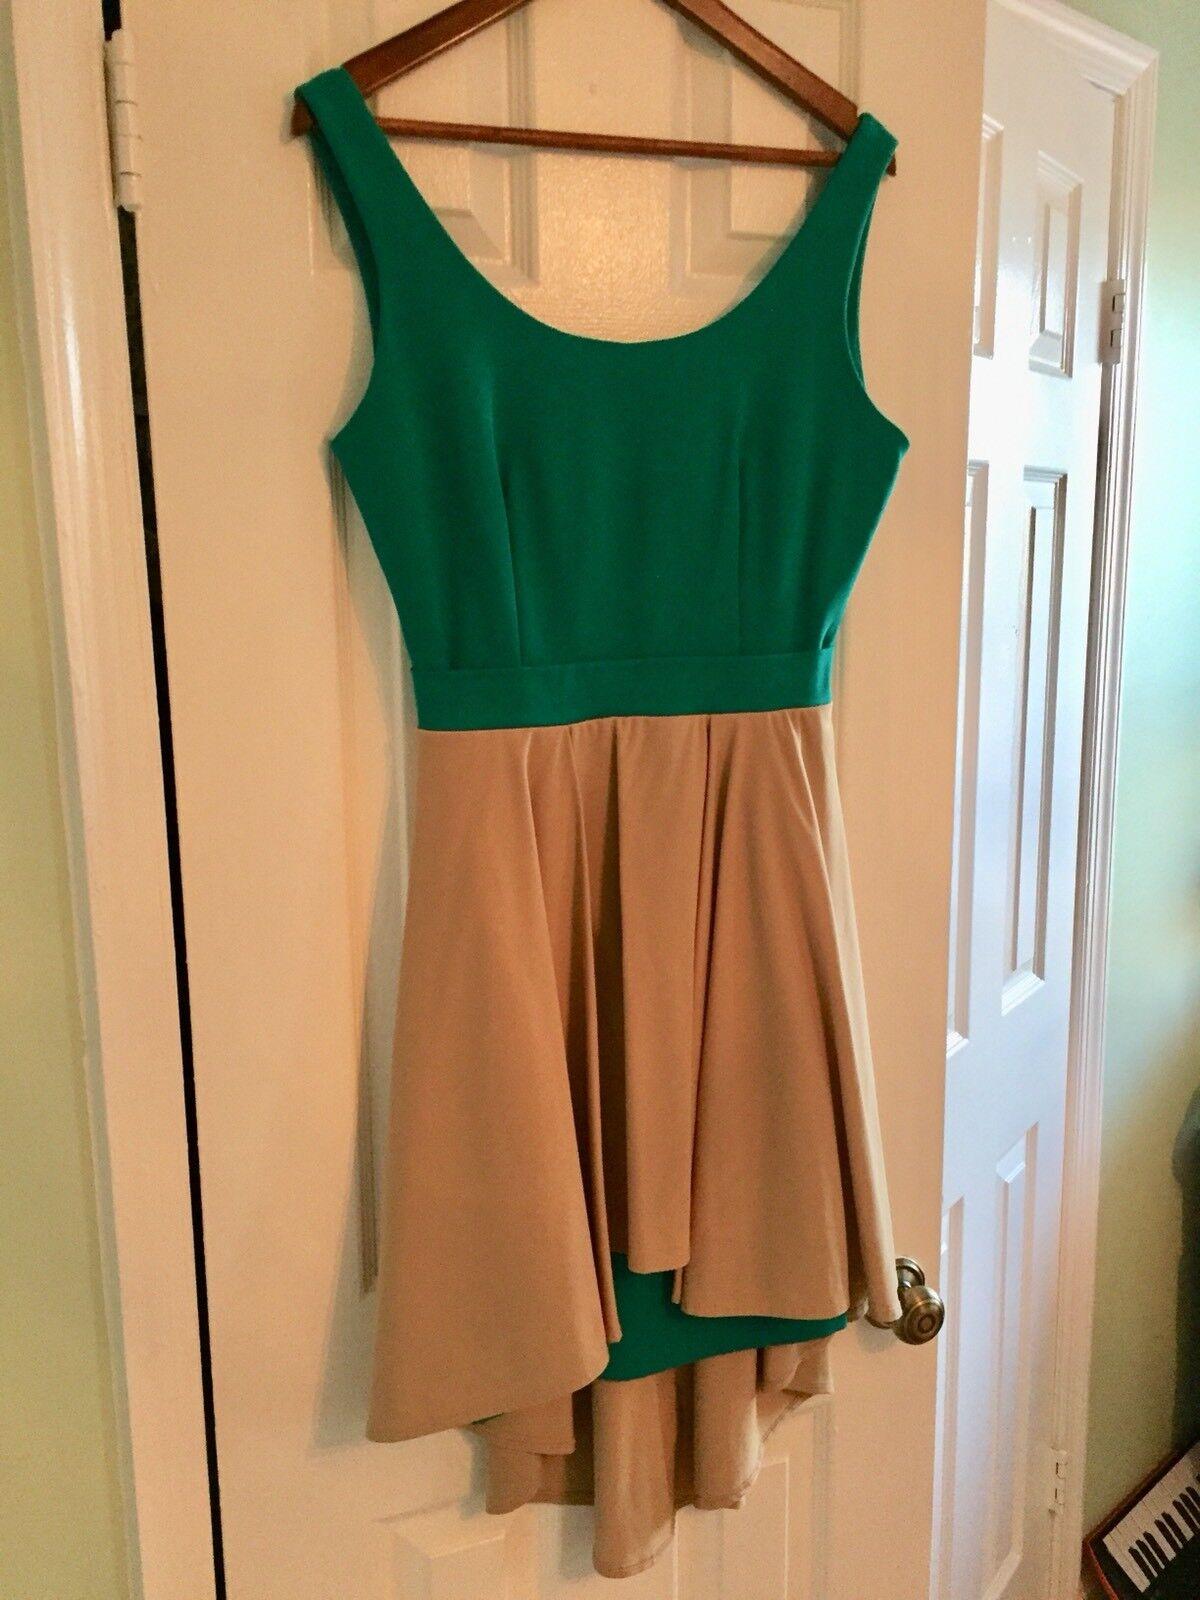 NWT NWT NWT Fara Simoyi Women's Handmade Couture Dress, Size 8 31ee6f